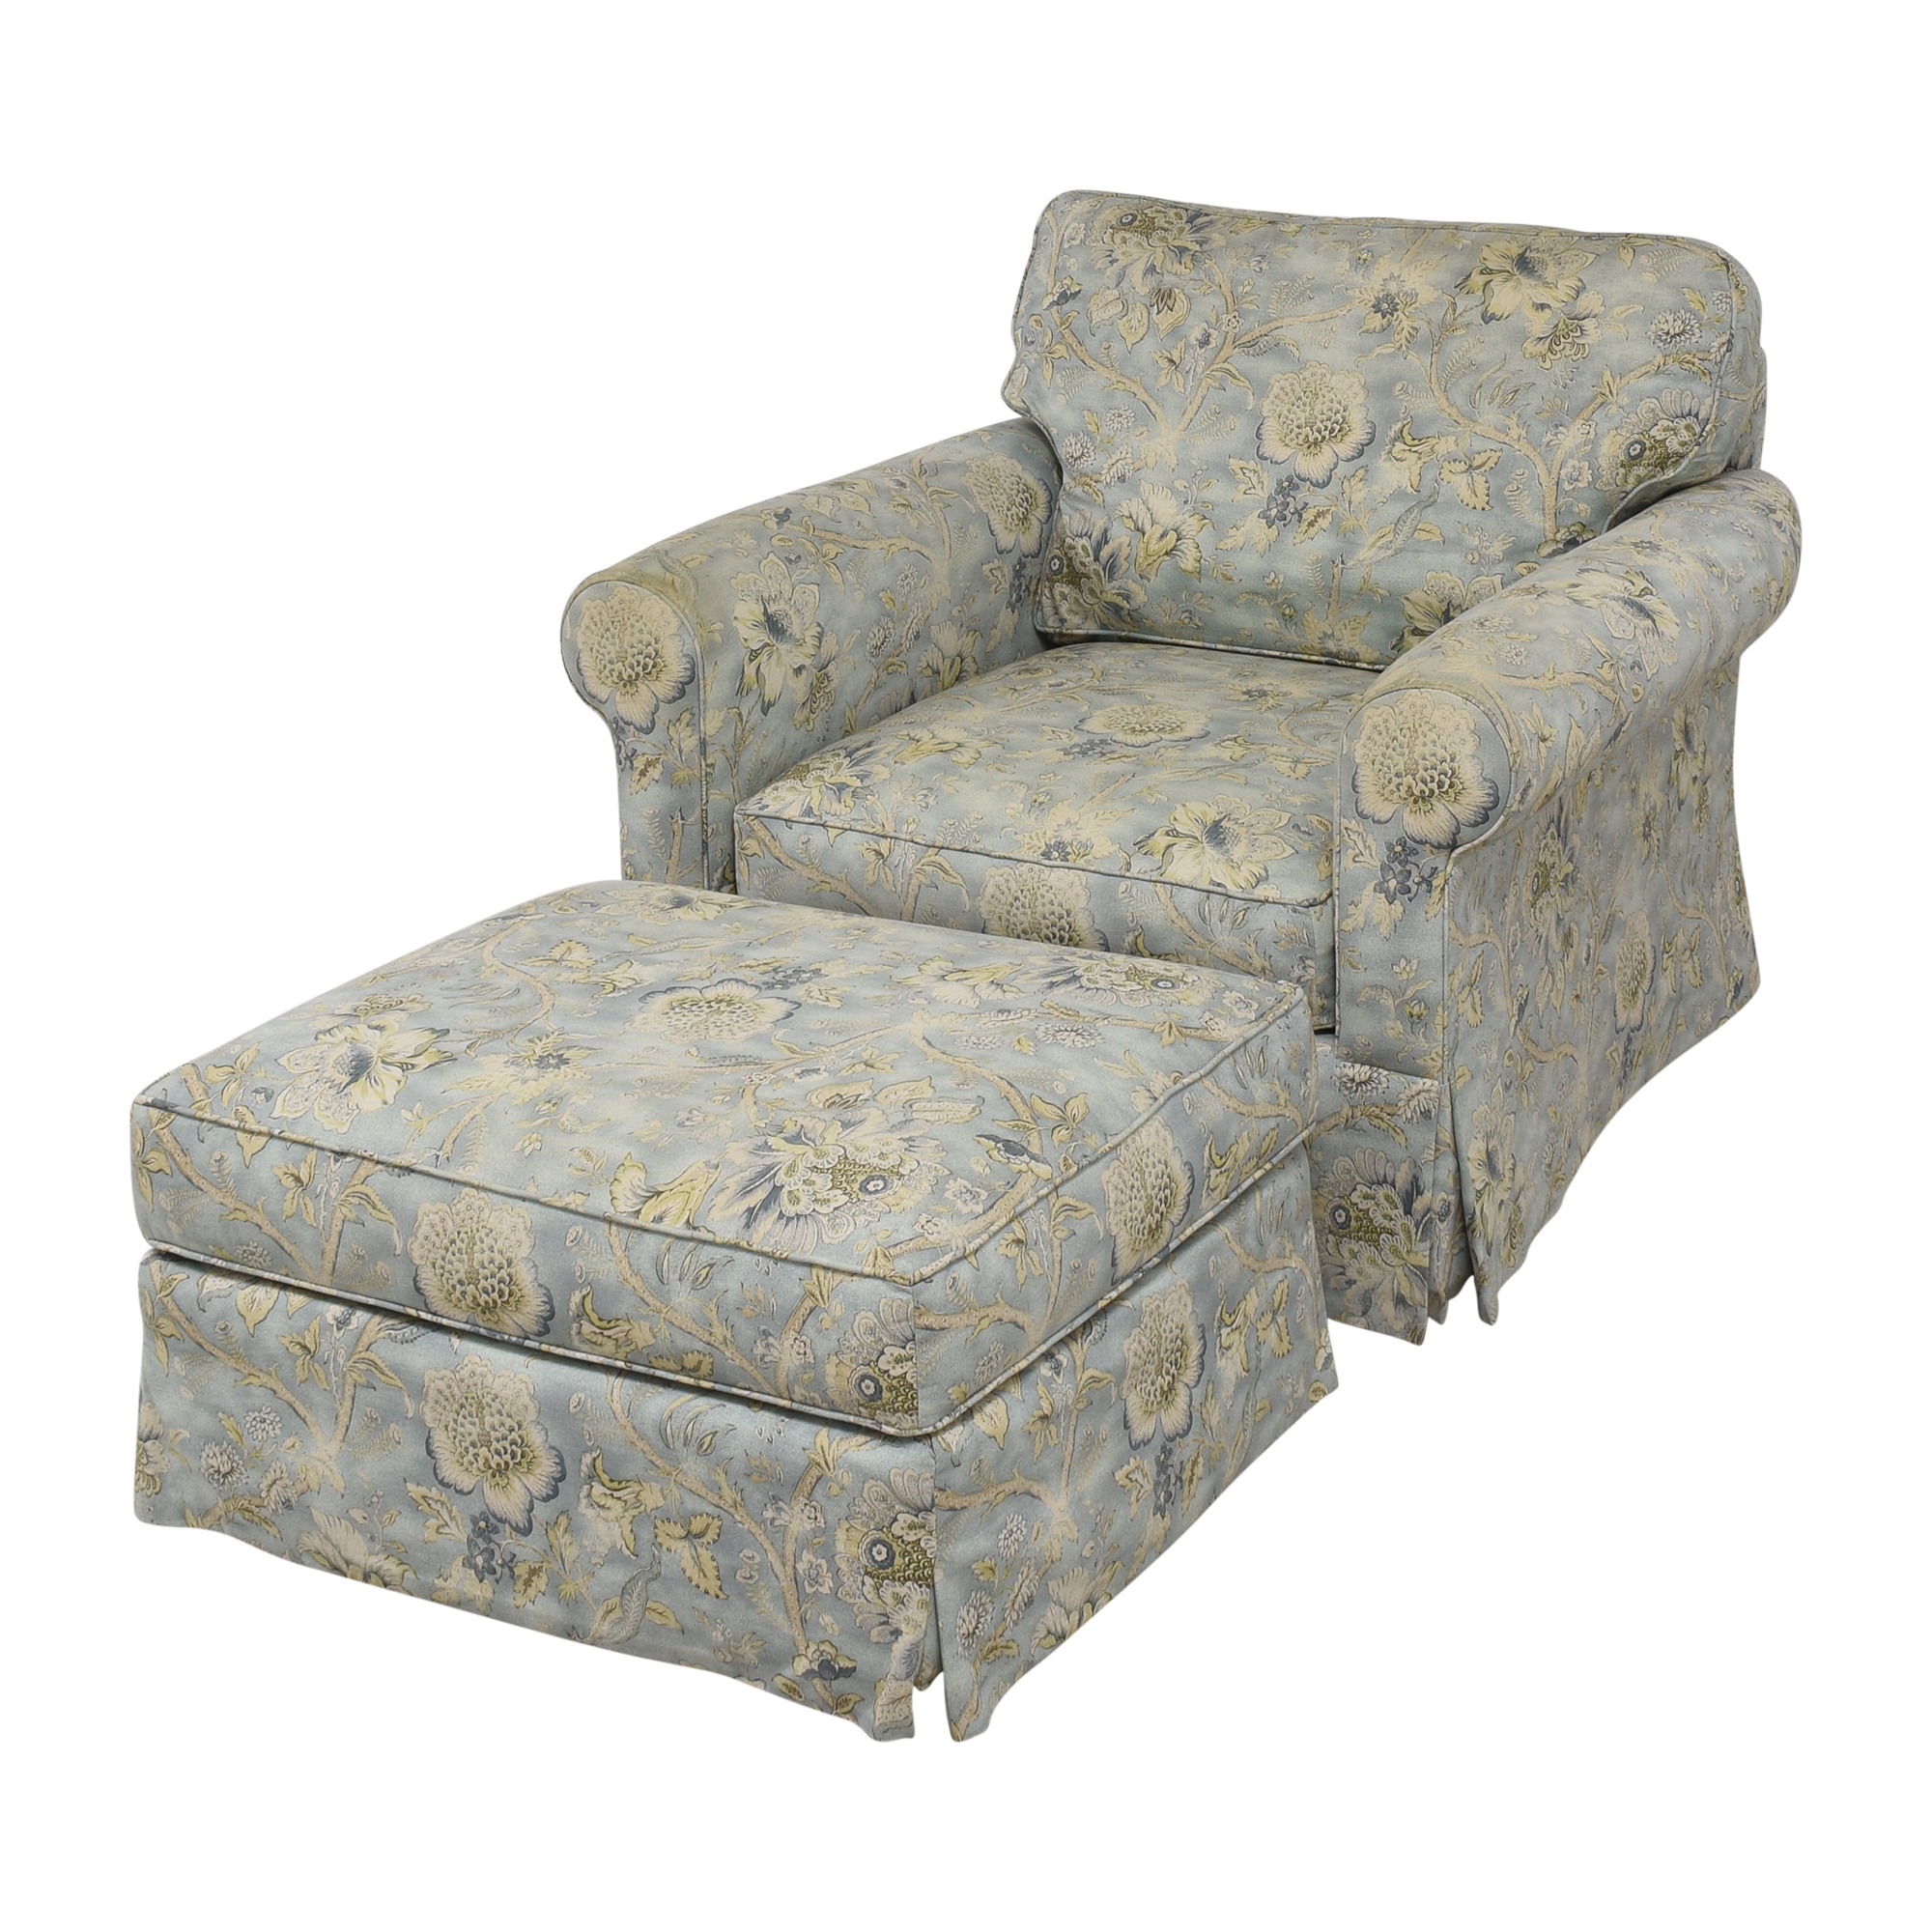 Arhaus Arhaus Baldwin Upholstered Swivel Chair with Ottoman price